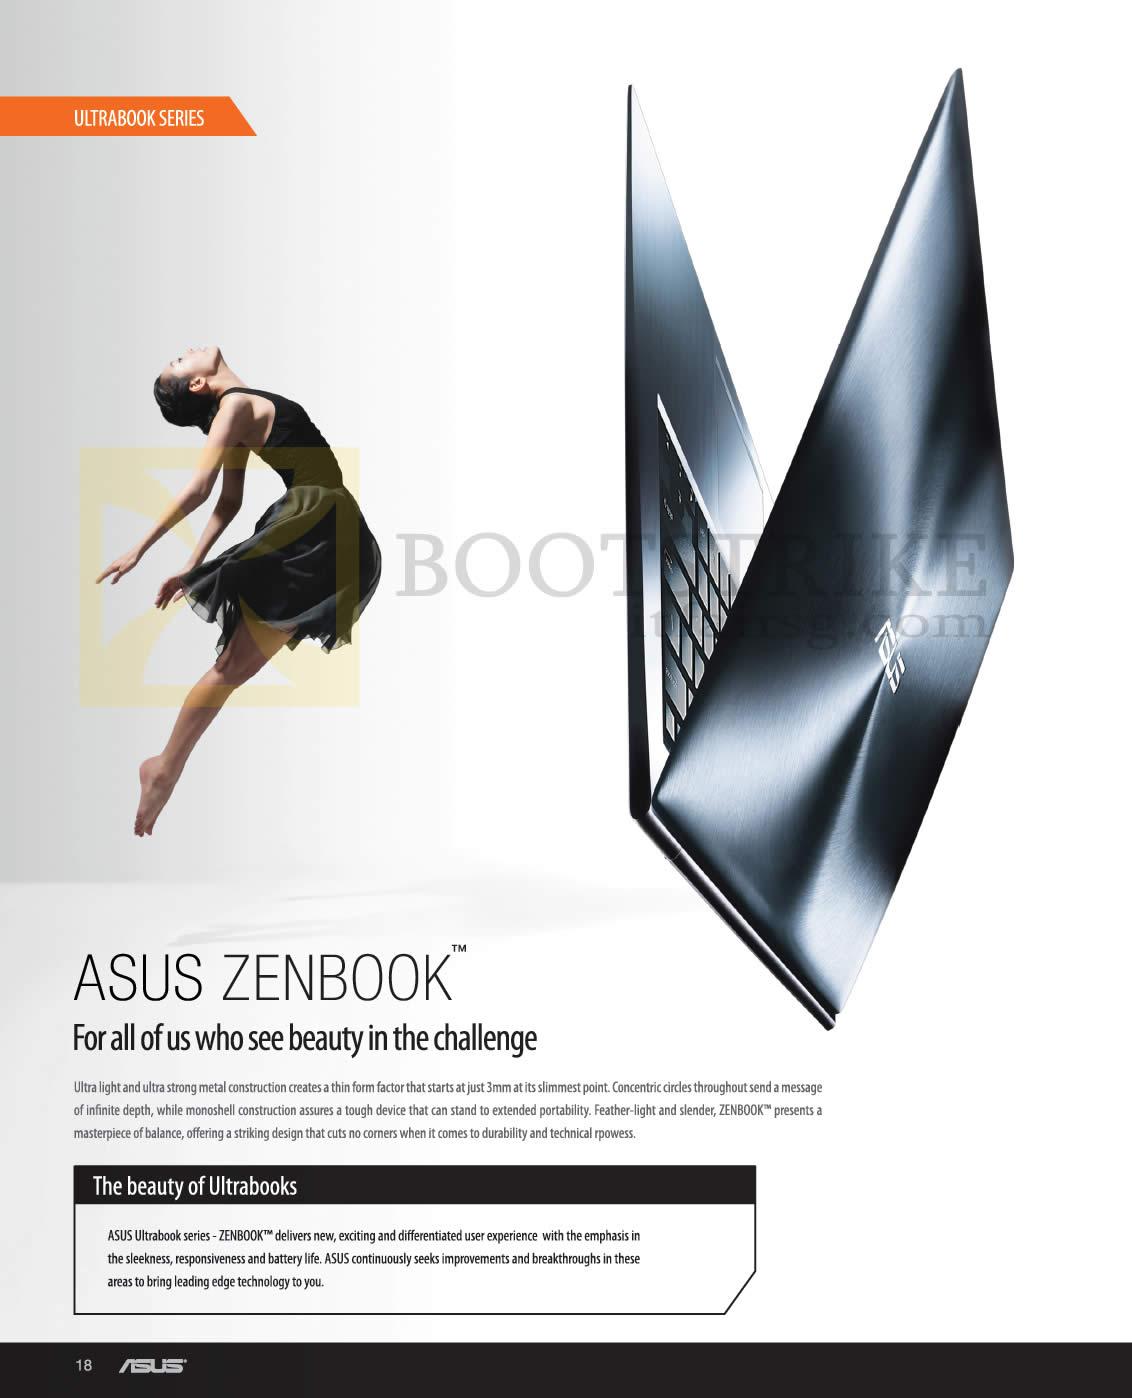 SITEX 2012 price list image brochure of ASUS Notebooks Zenbook Ultrabook Features